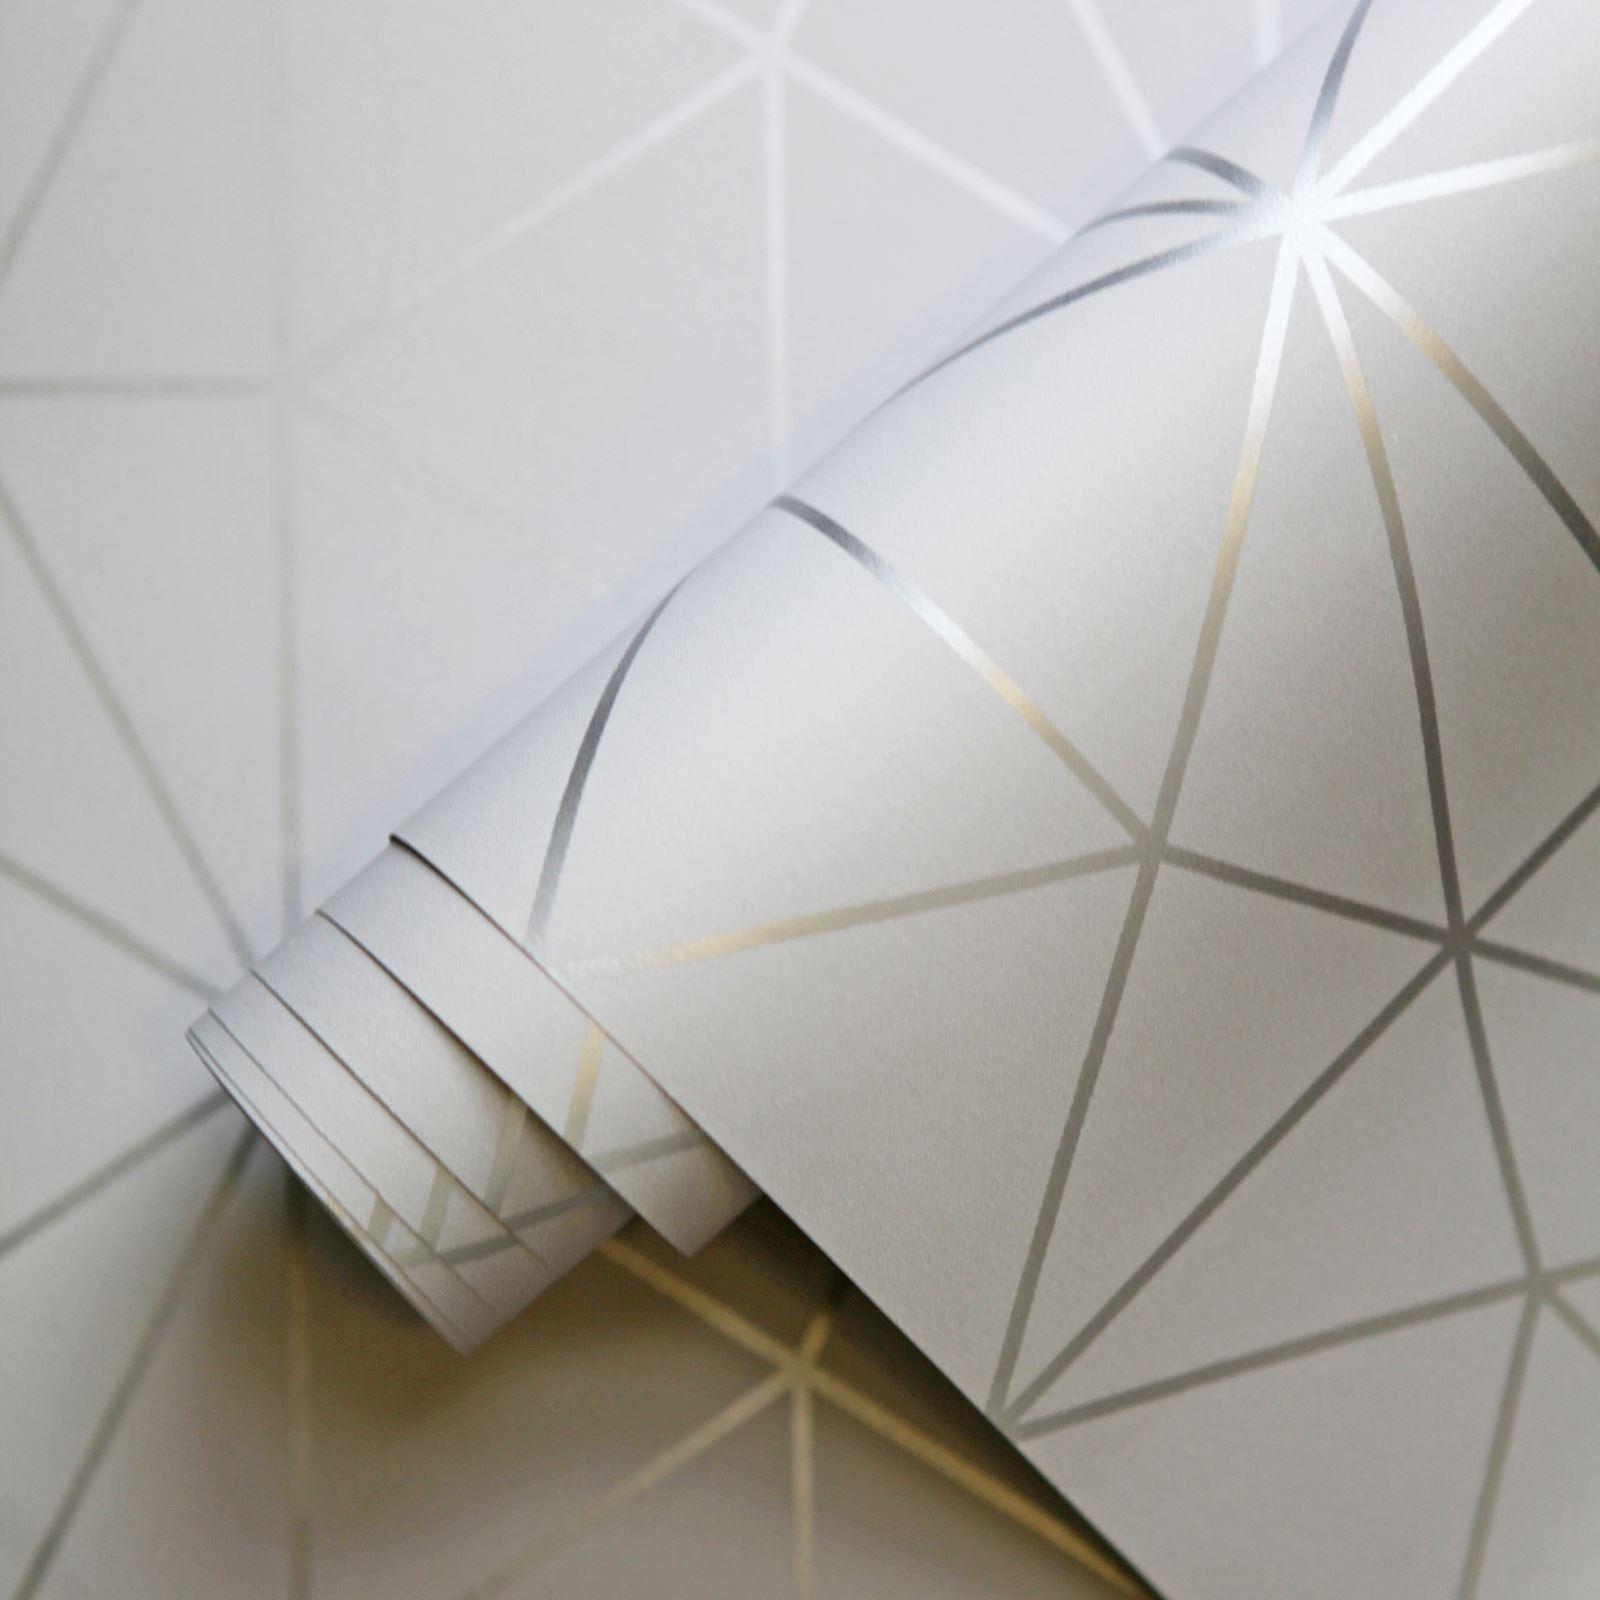 miniatura 135 - Carta da Parati Geometrica Arredamento Camera Moderno Vari Disegni e Colori